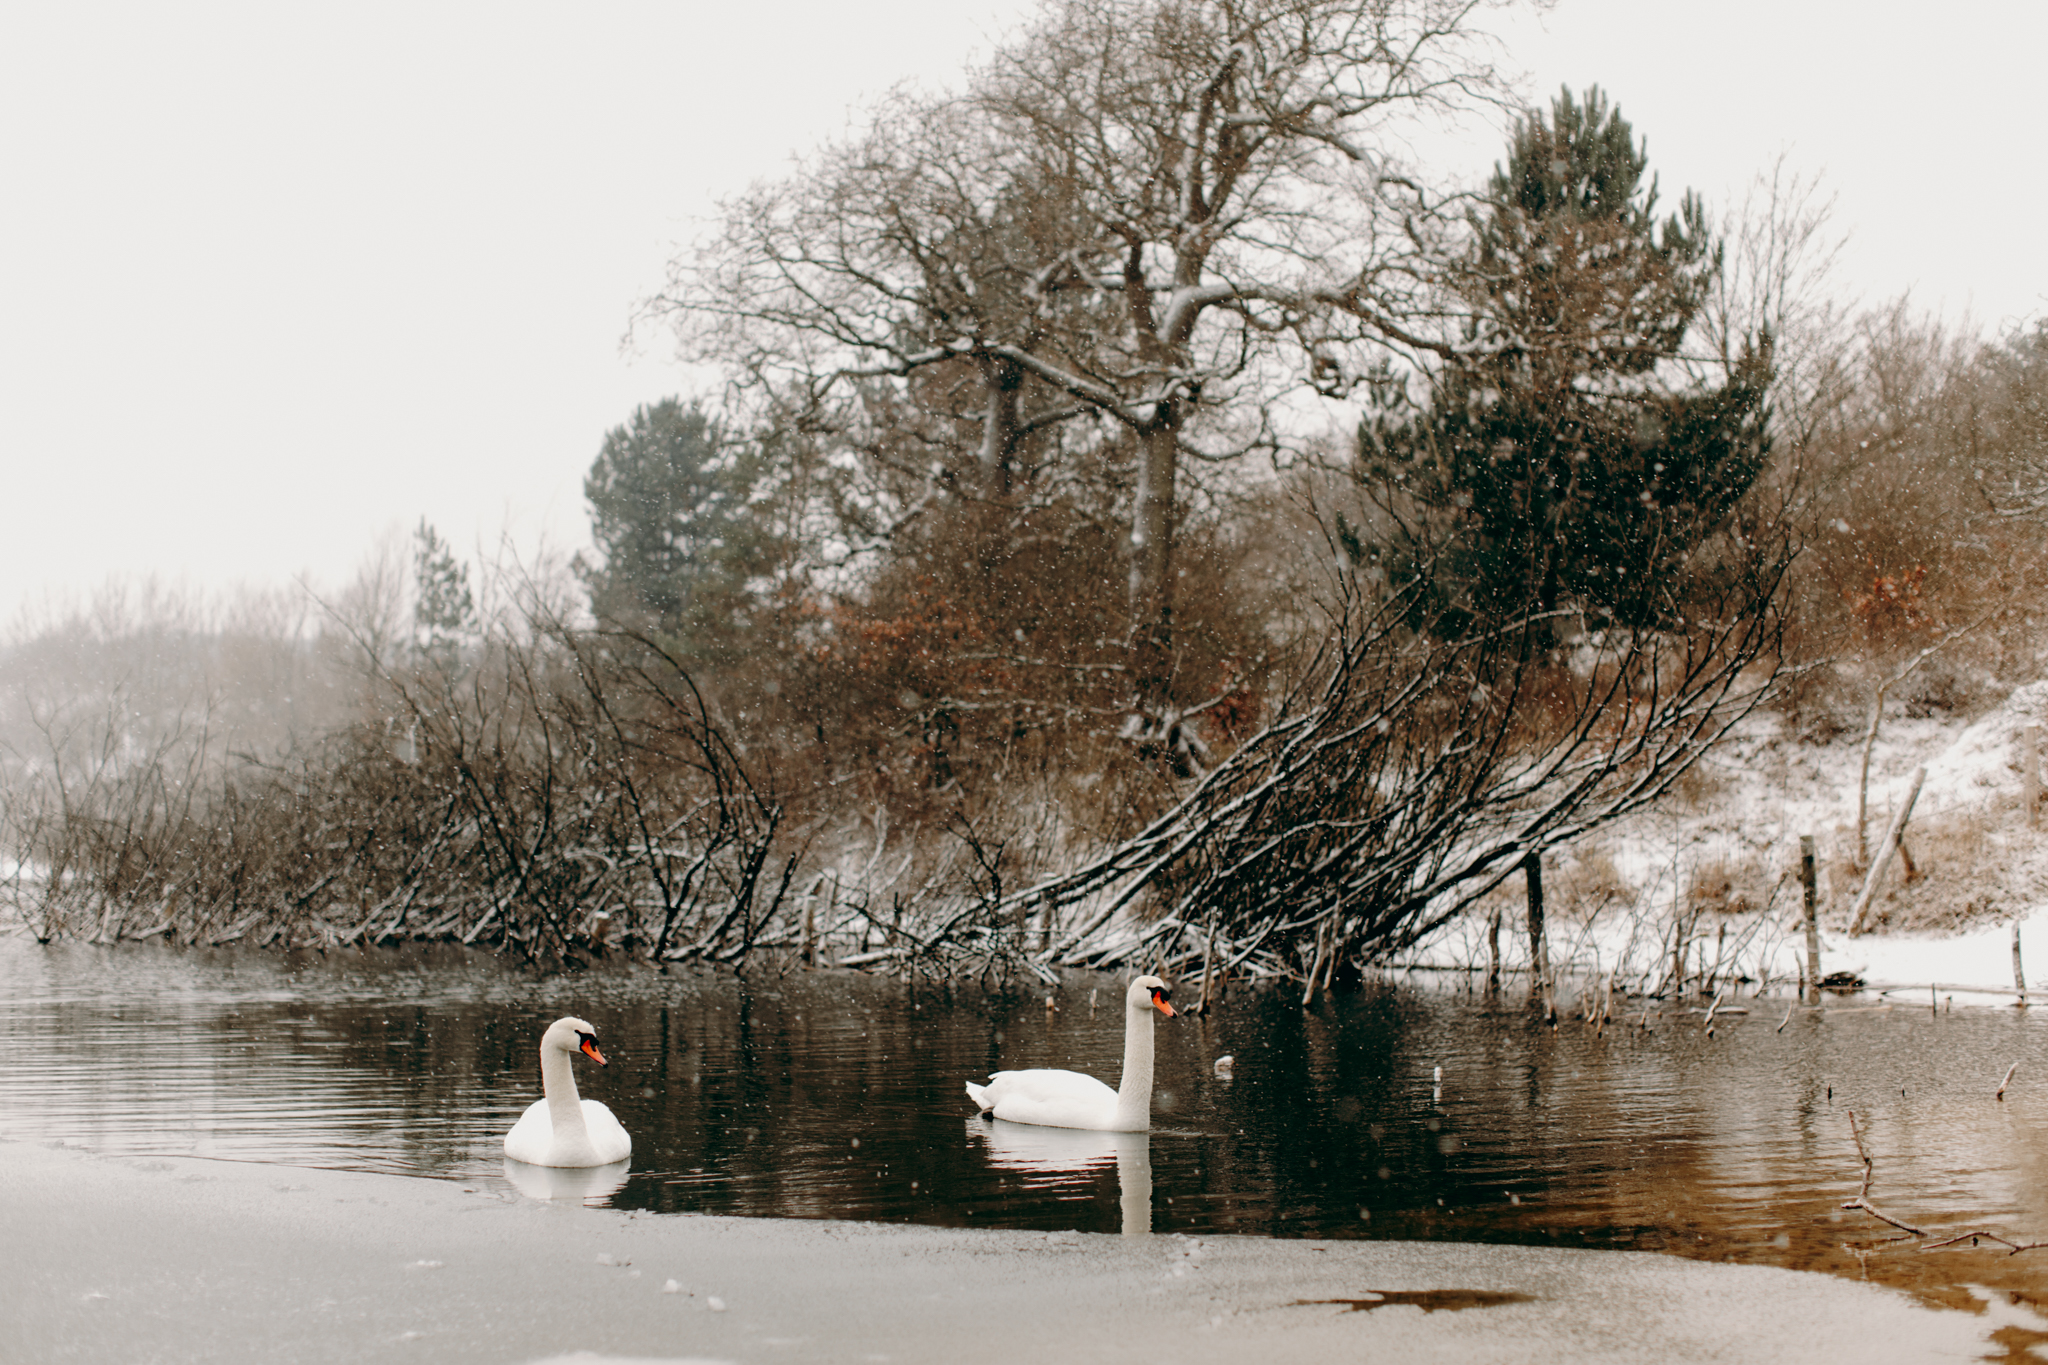 040-winter-sneeuw-oosterplas-bloemendaal.jpg